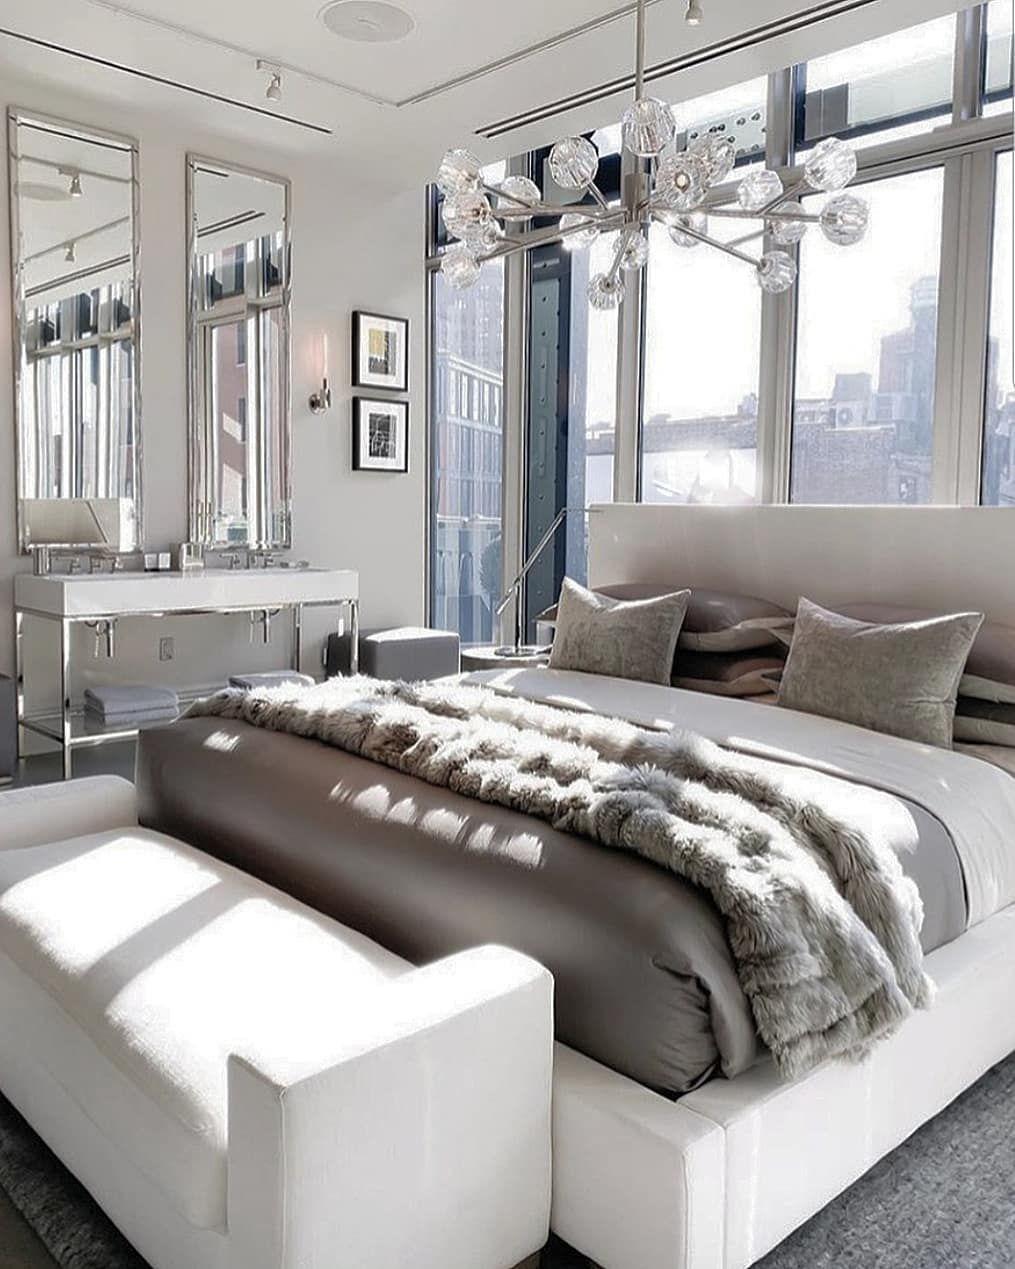 Bedroom goals!.. . By Restoration Hardware Via @elisesglamspace #lovefordesigns - All in One Blog #restorationhardware